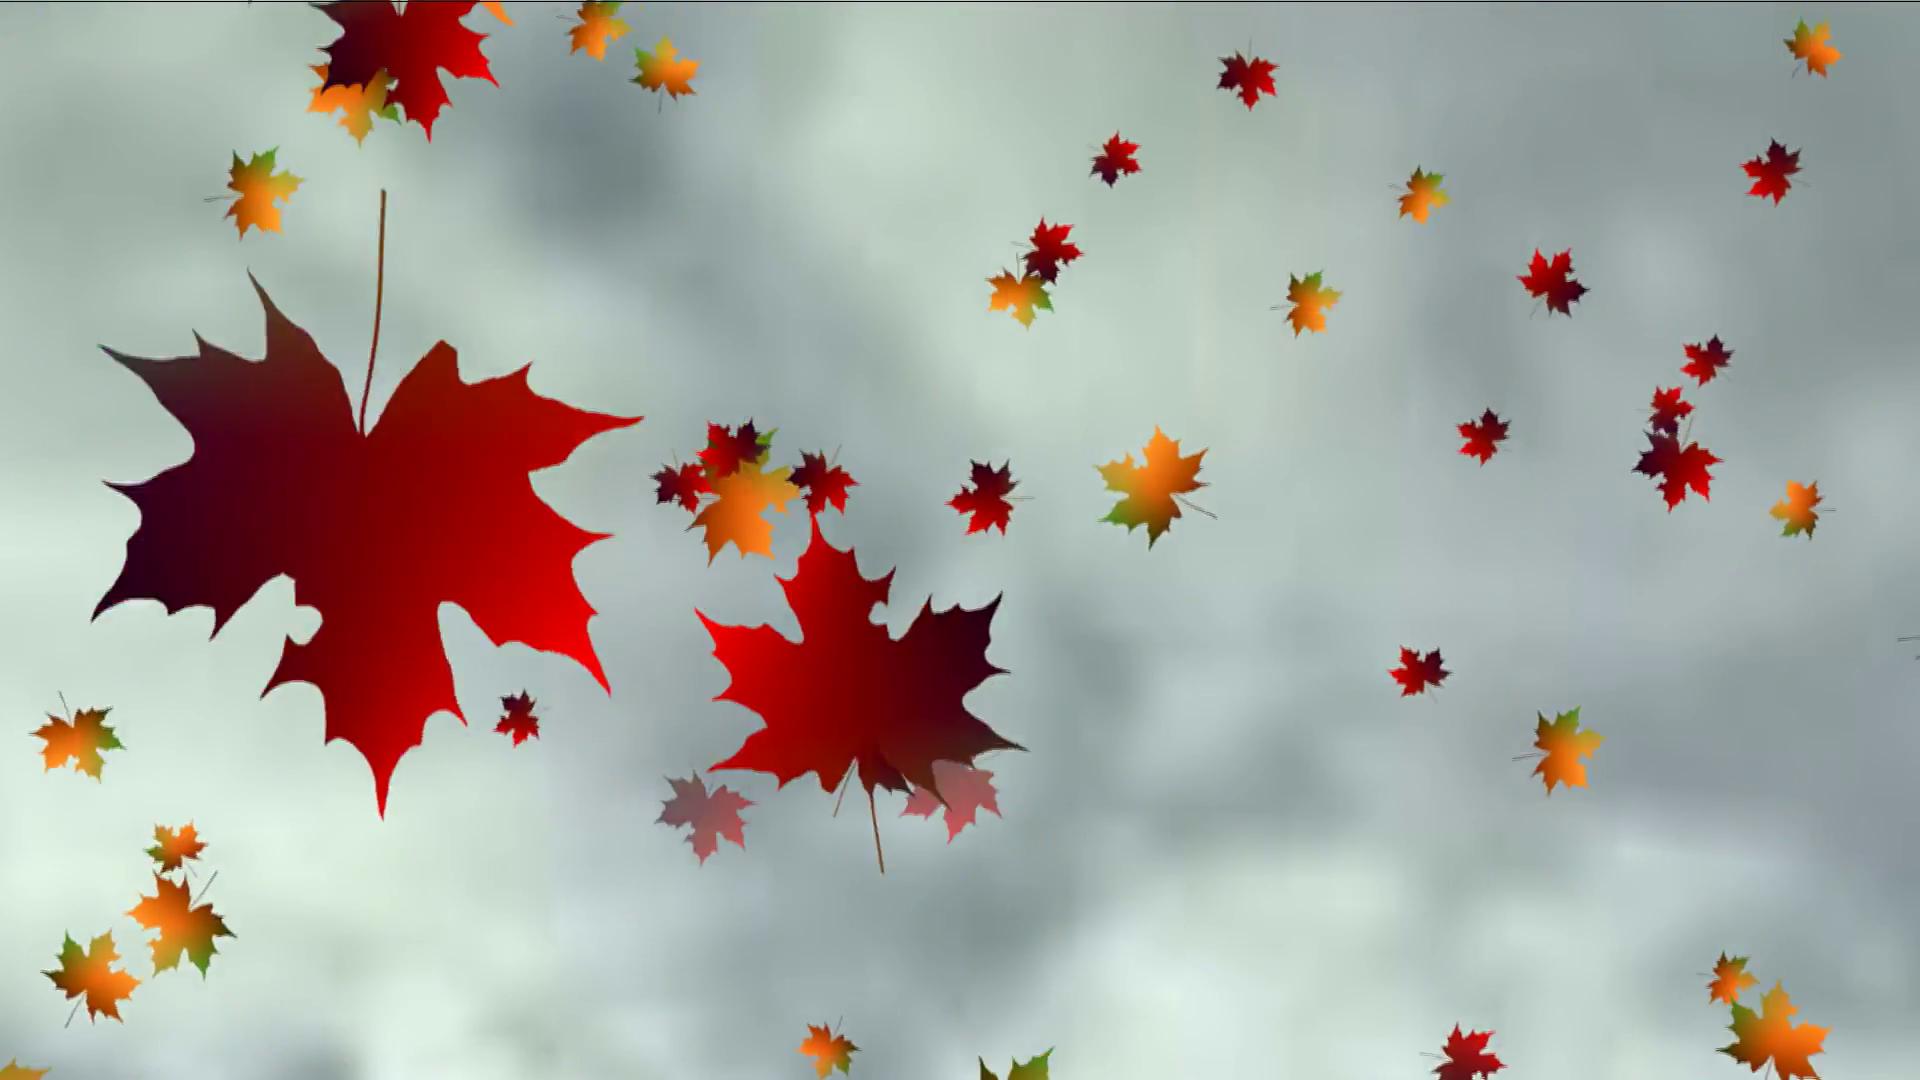 Animated Autumn Leaves Falling Motion Background - Videoblocks